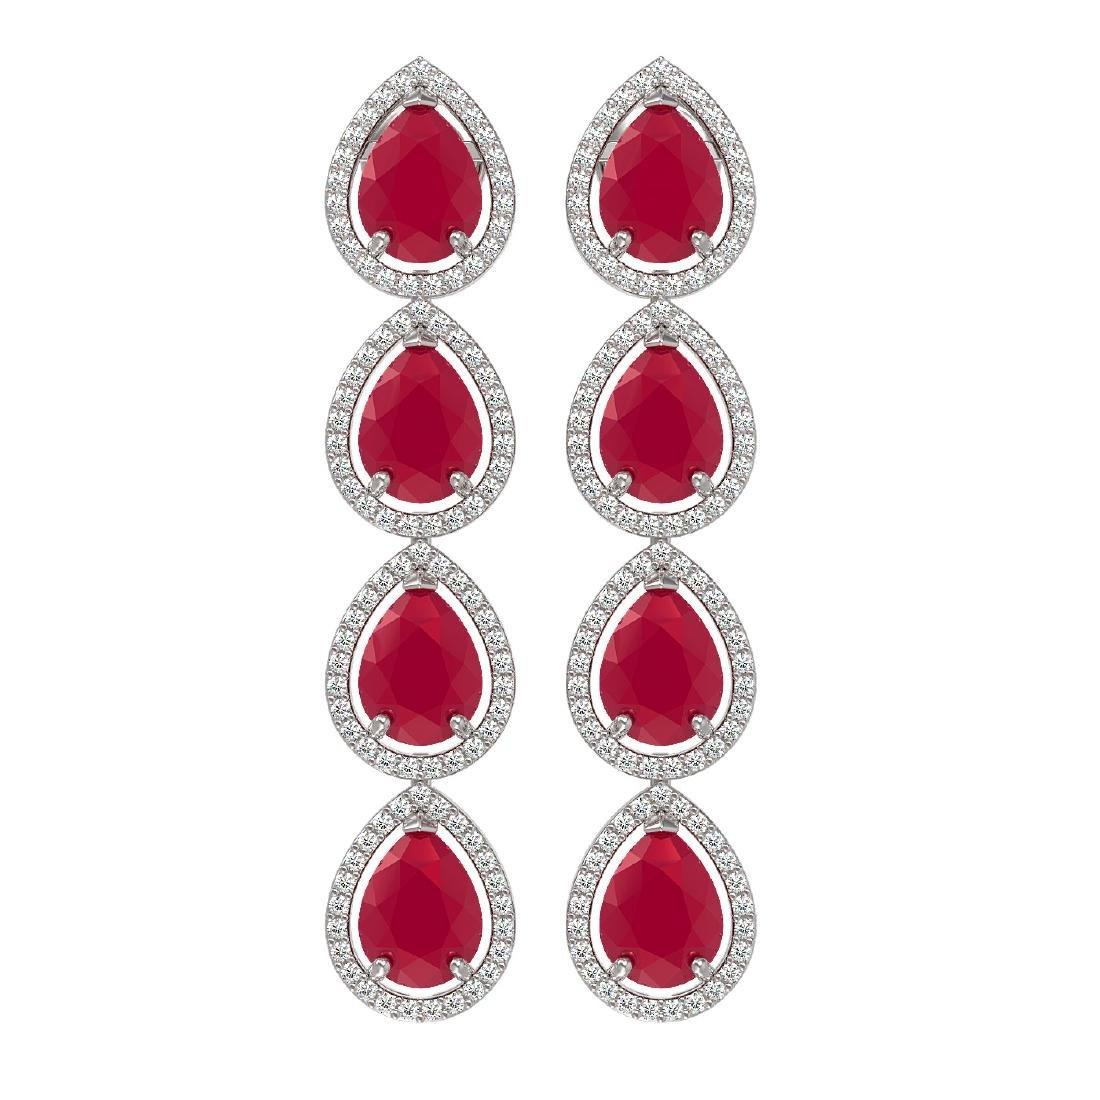 16.01 CTW Ruby & Diamond Halo Earrings 10K White Gold